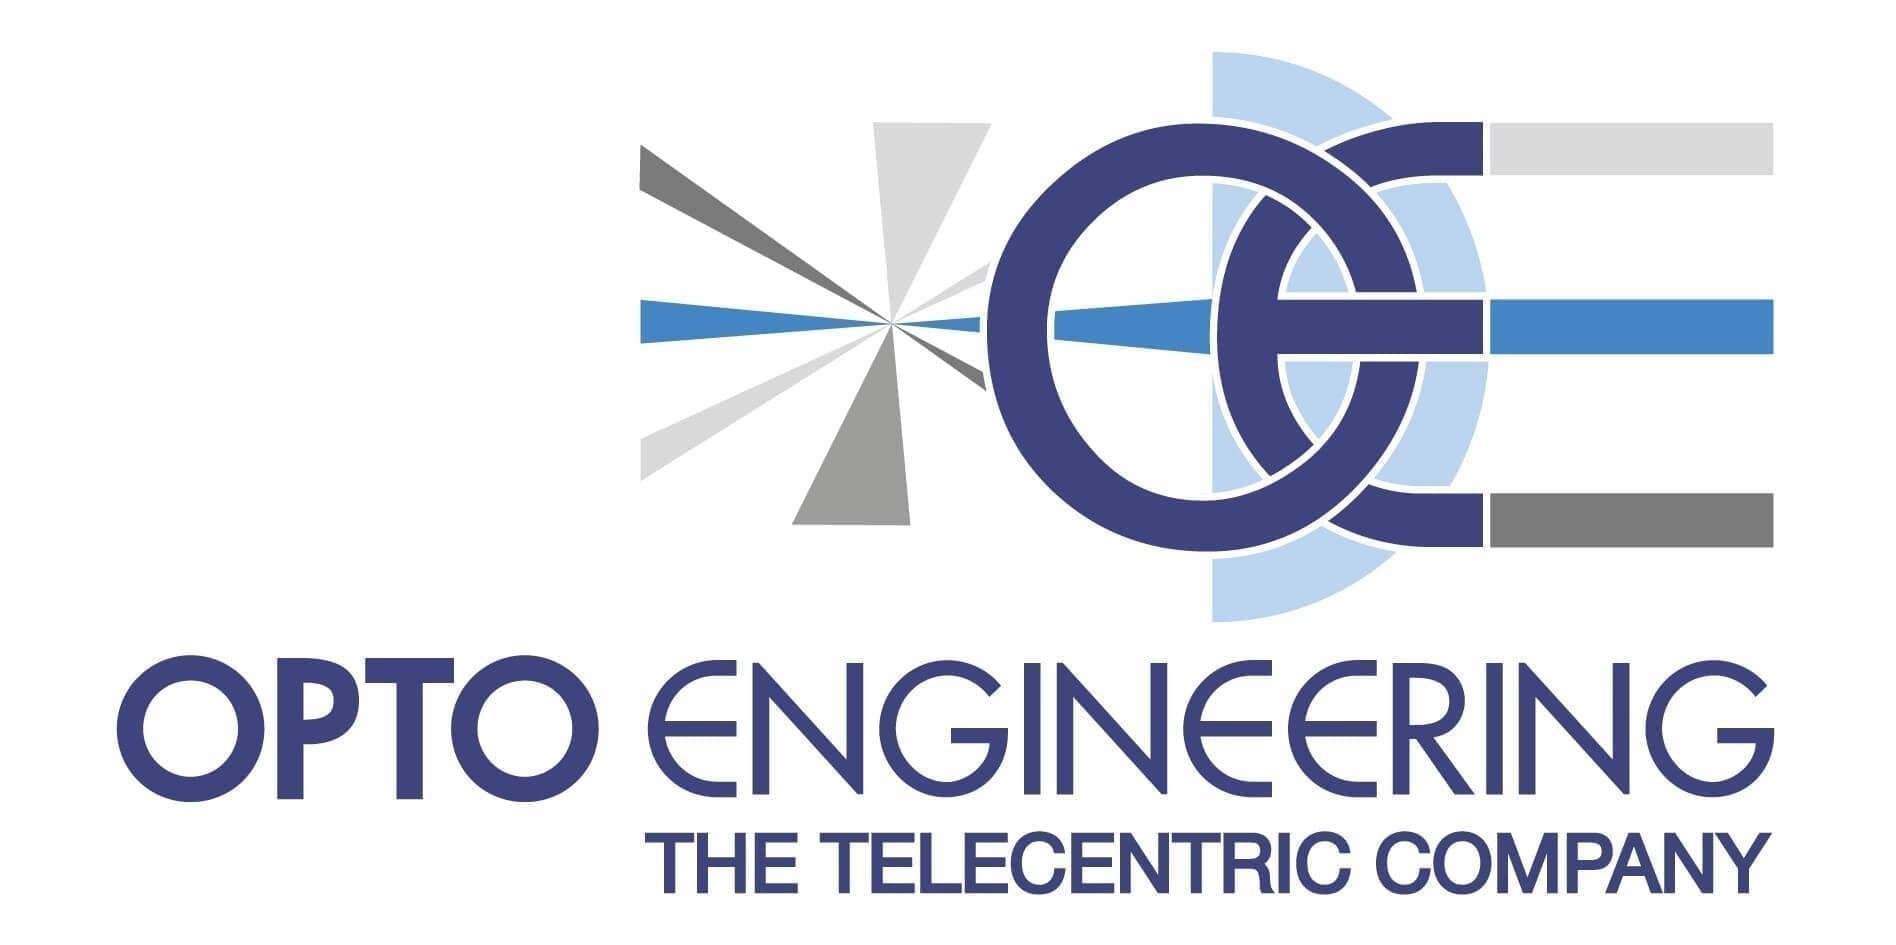 Opto-Engineering